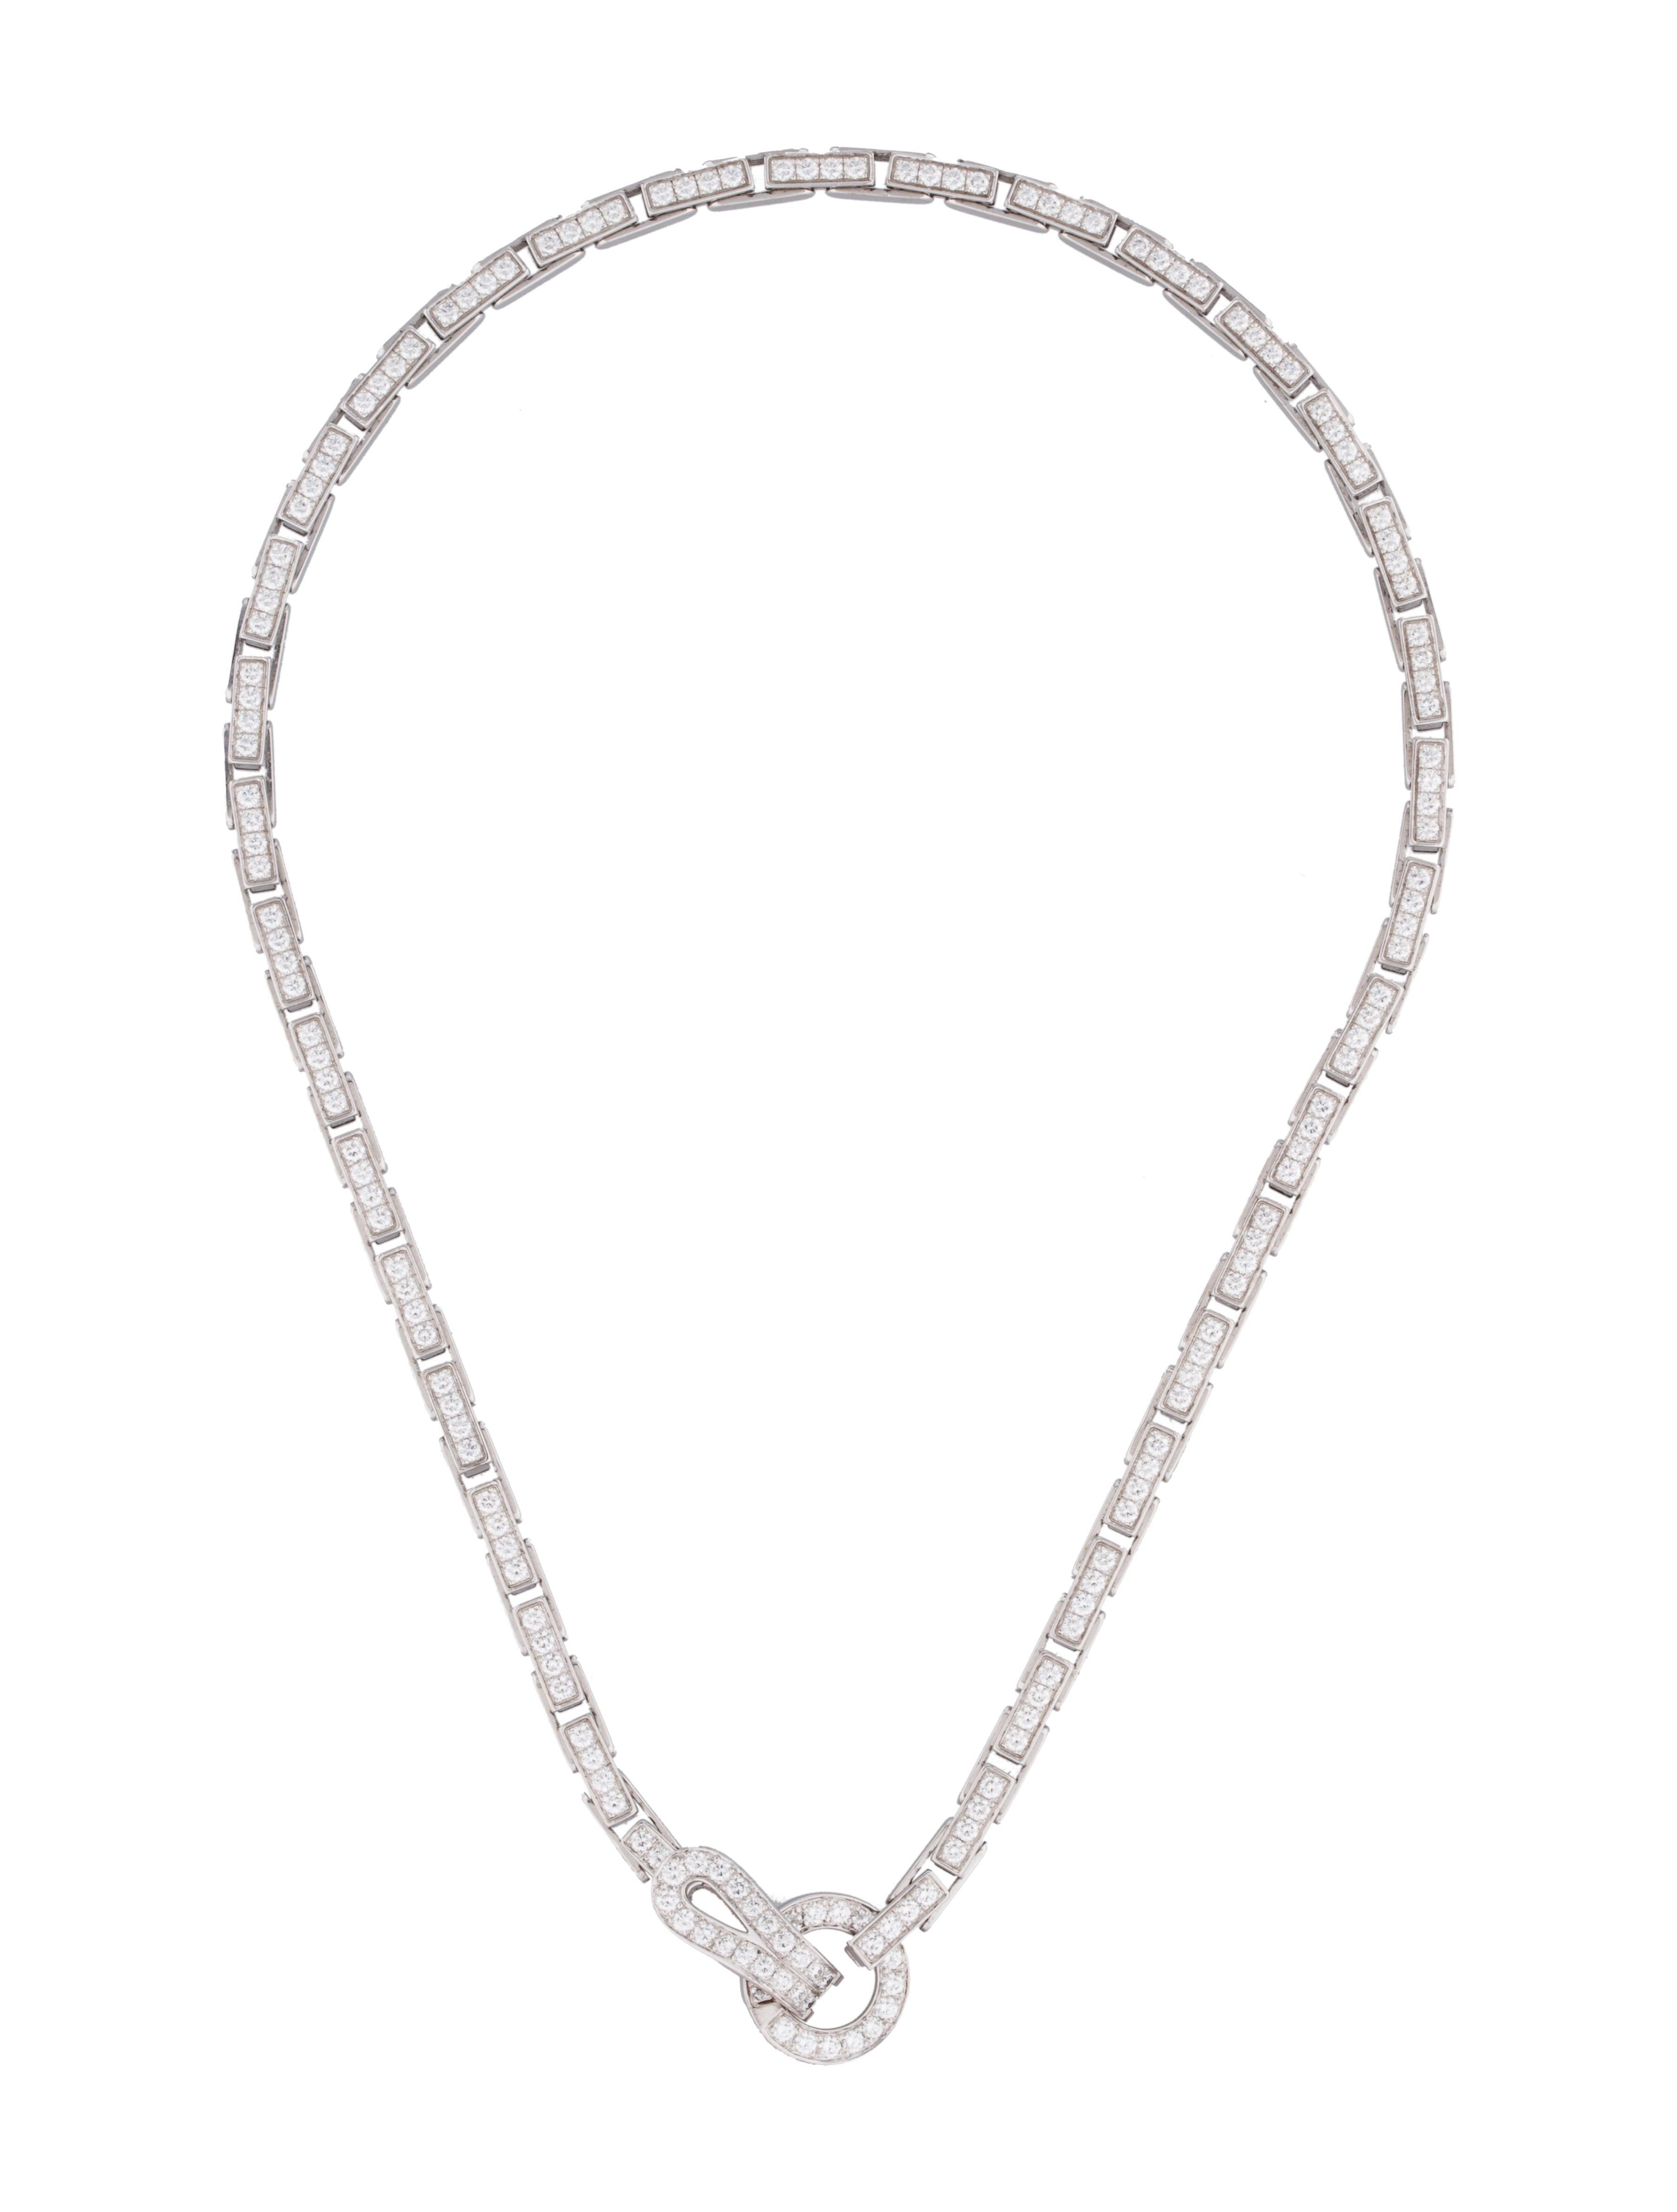 Cartier Agrafe Diamond Necklace - Necklaces - CRT21688 ...